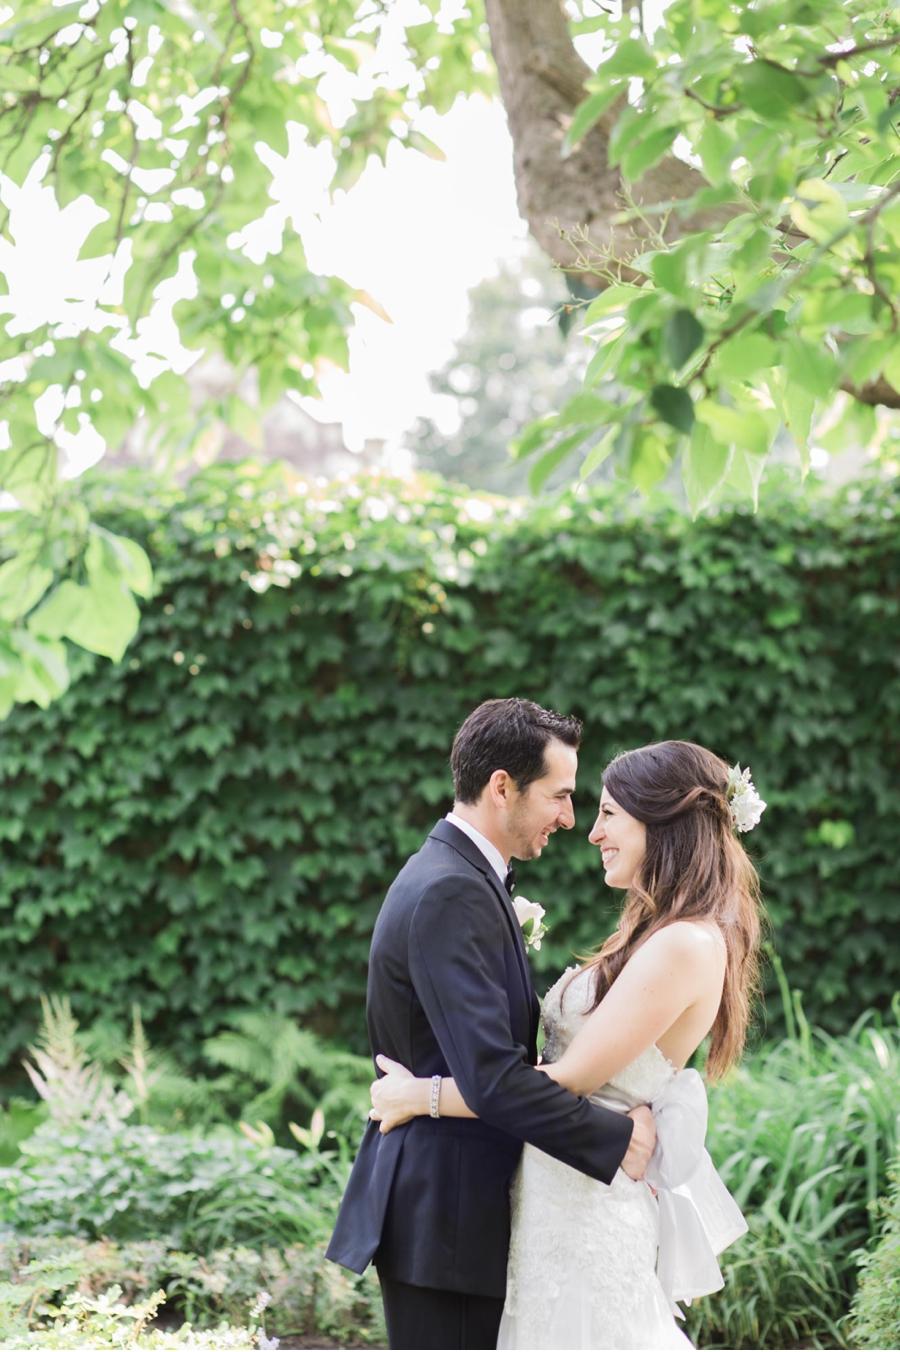 Martina-Wendland-Wedding-Photographer